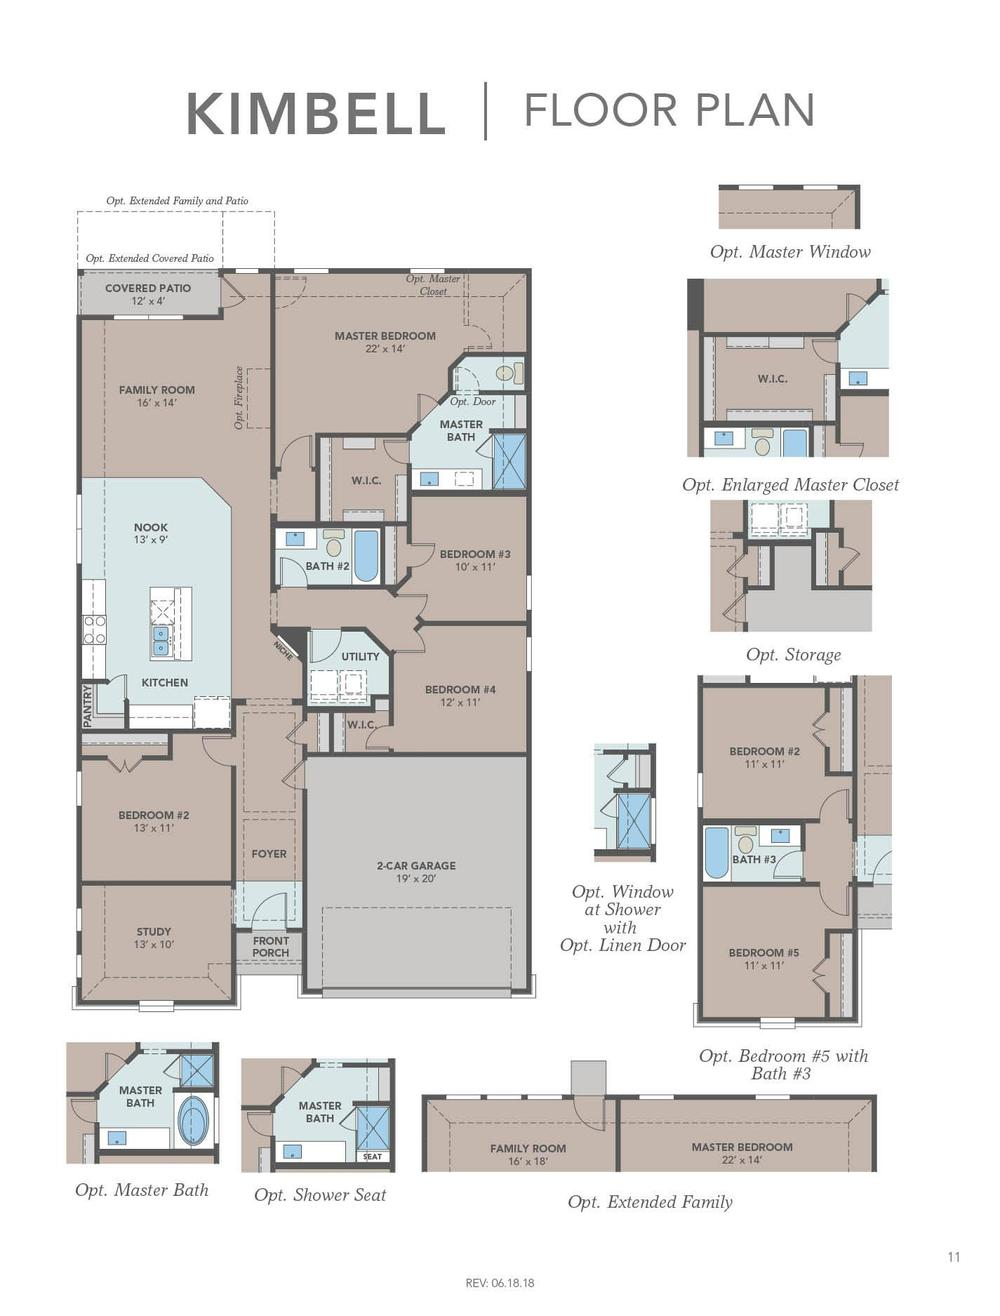 Kimbell Floor Plan